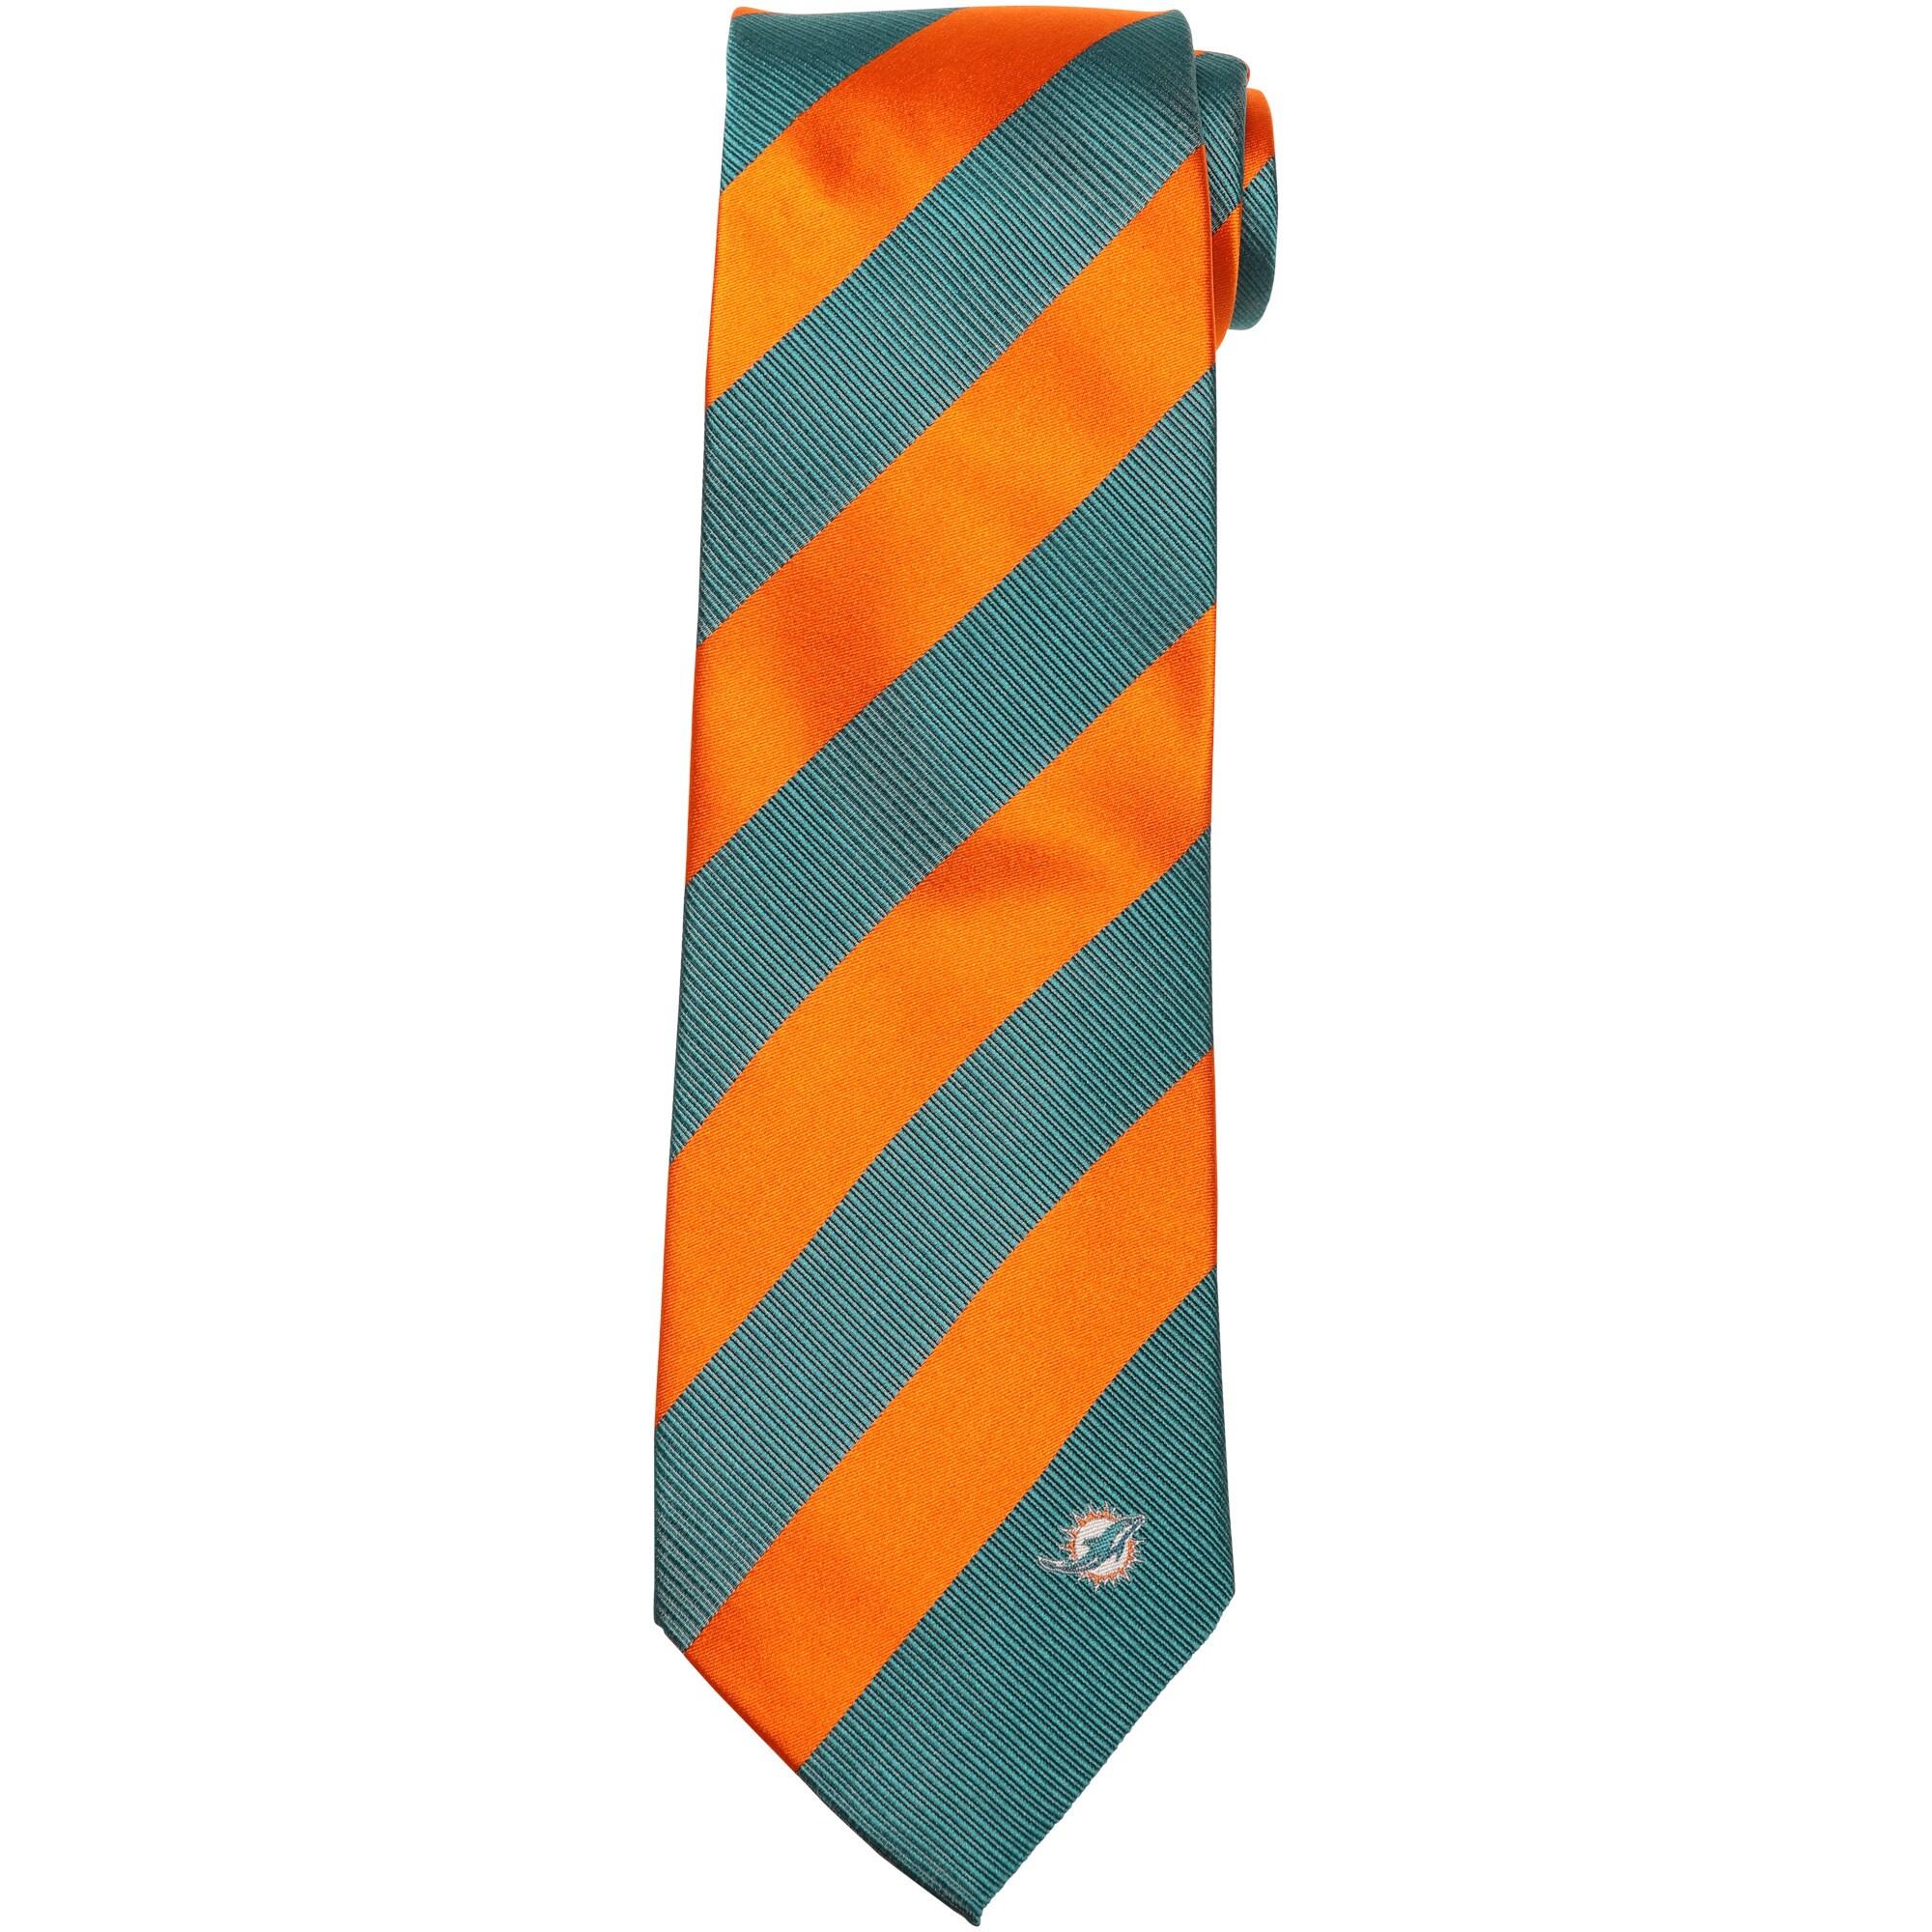 Miami Dolphins Regiment Woven Silk Tie